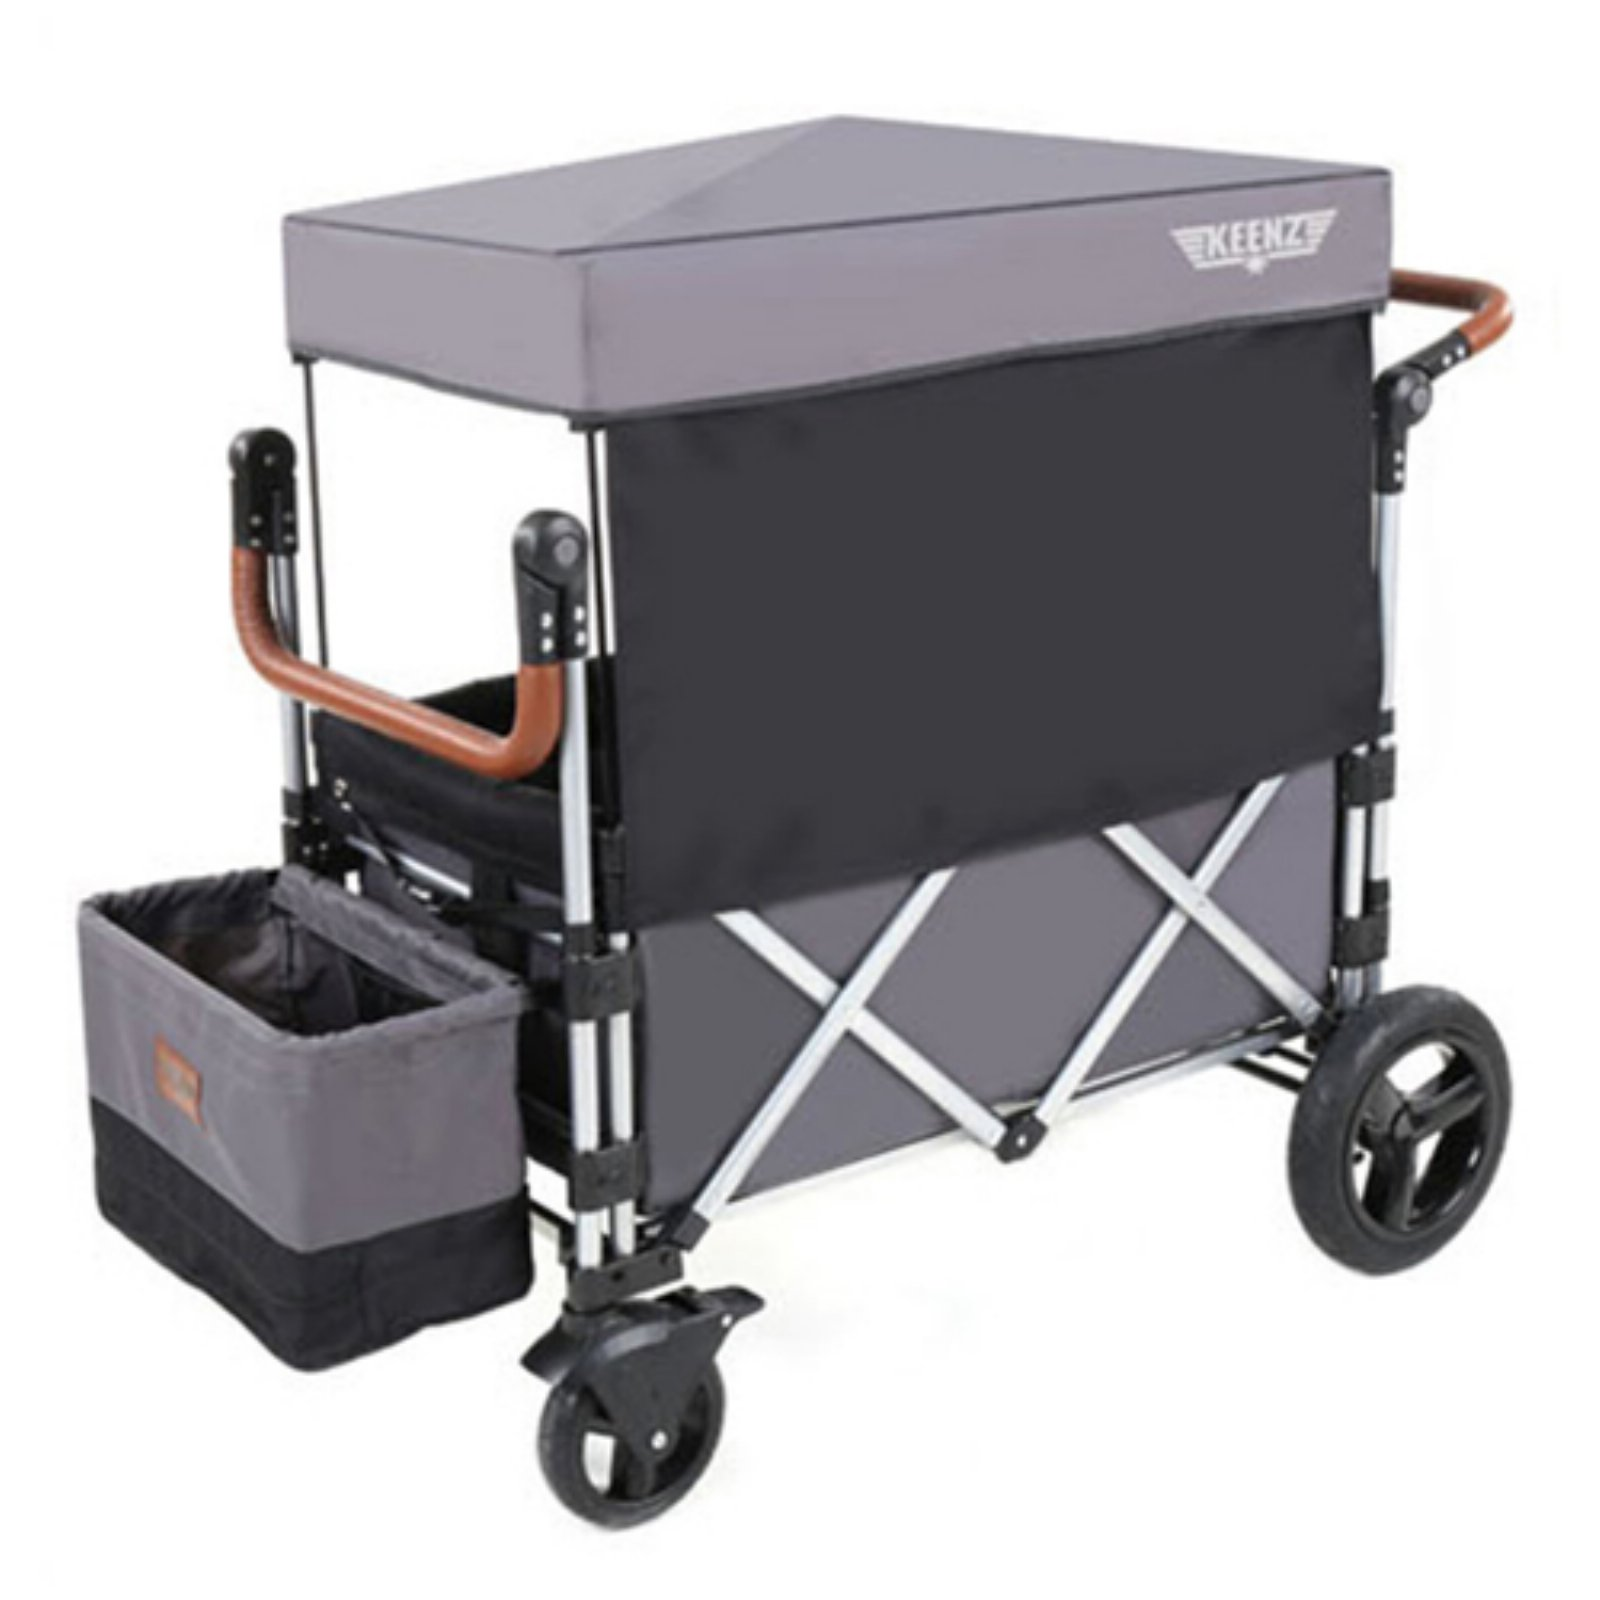 Keenz Original 7 Stroller Wagon Dark Gray - 7-GREY